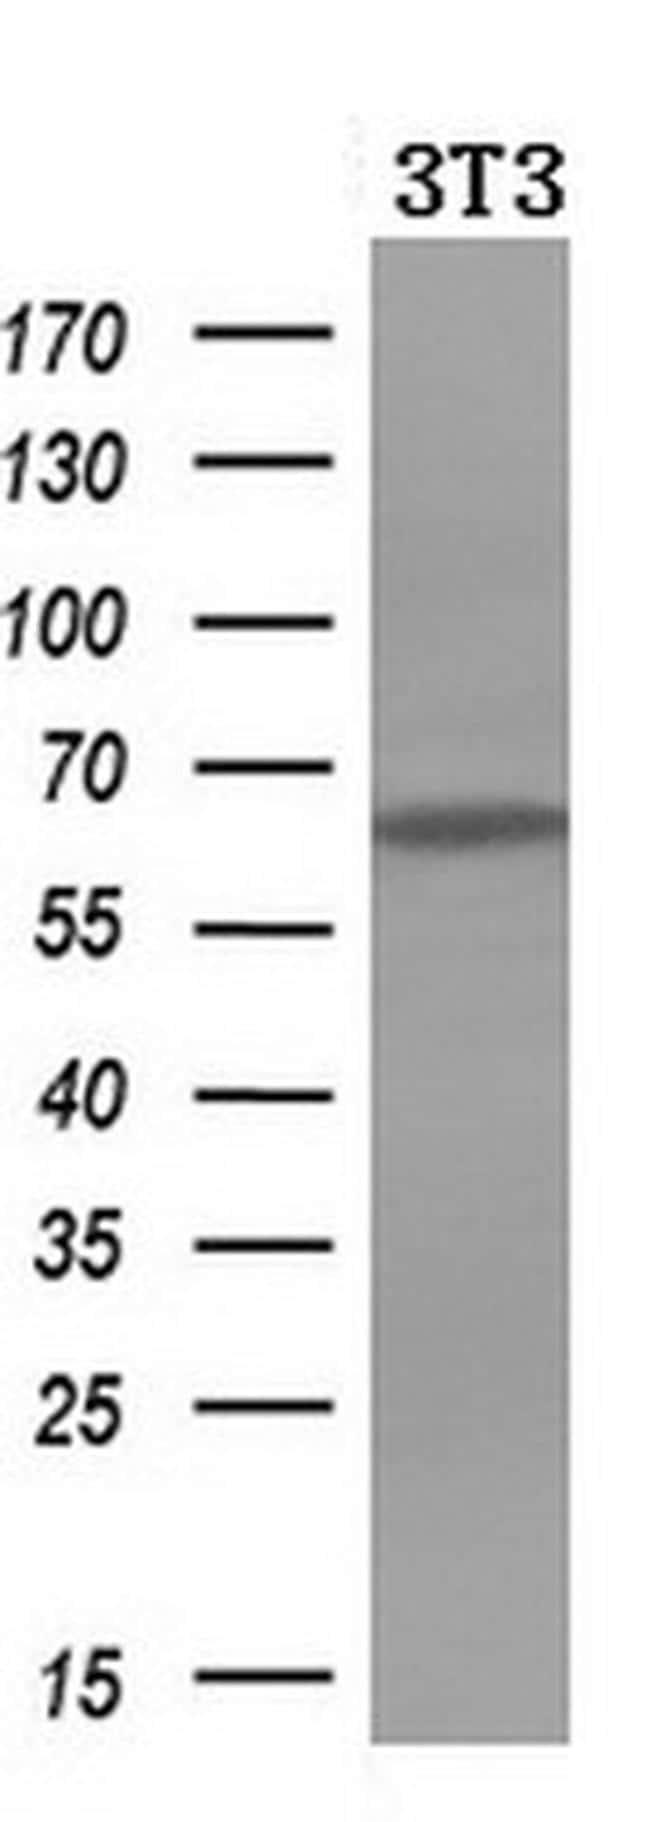 Iduronate 2 Sulfatase Antibody in Western Blot (WB)